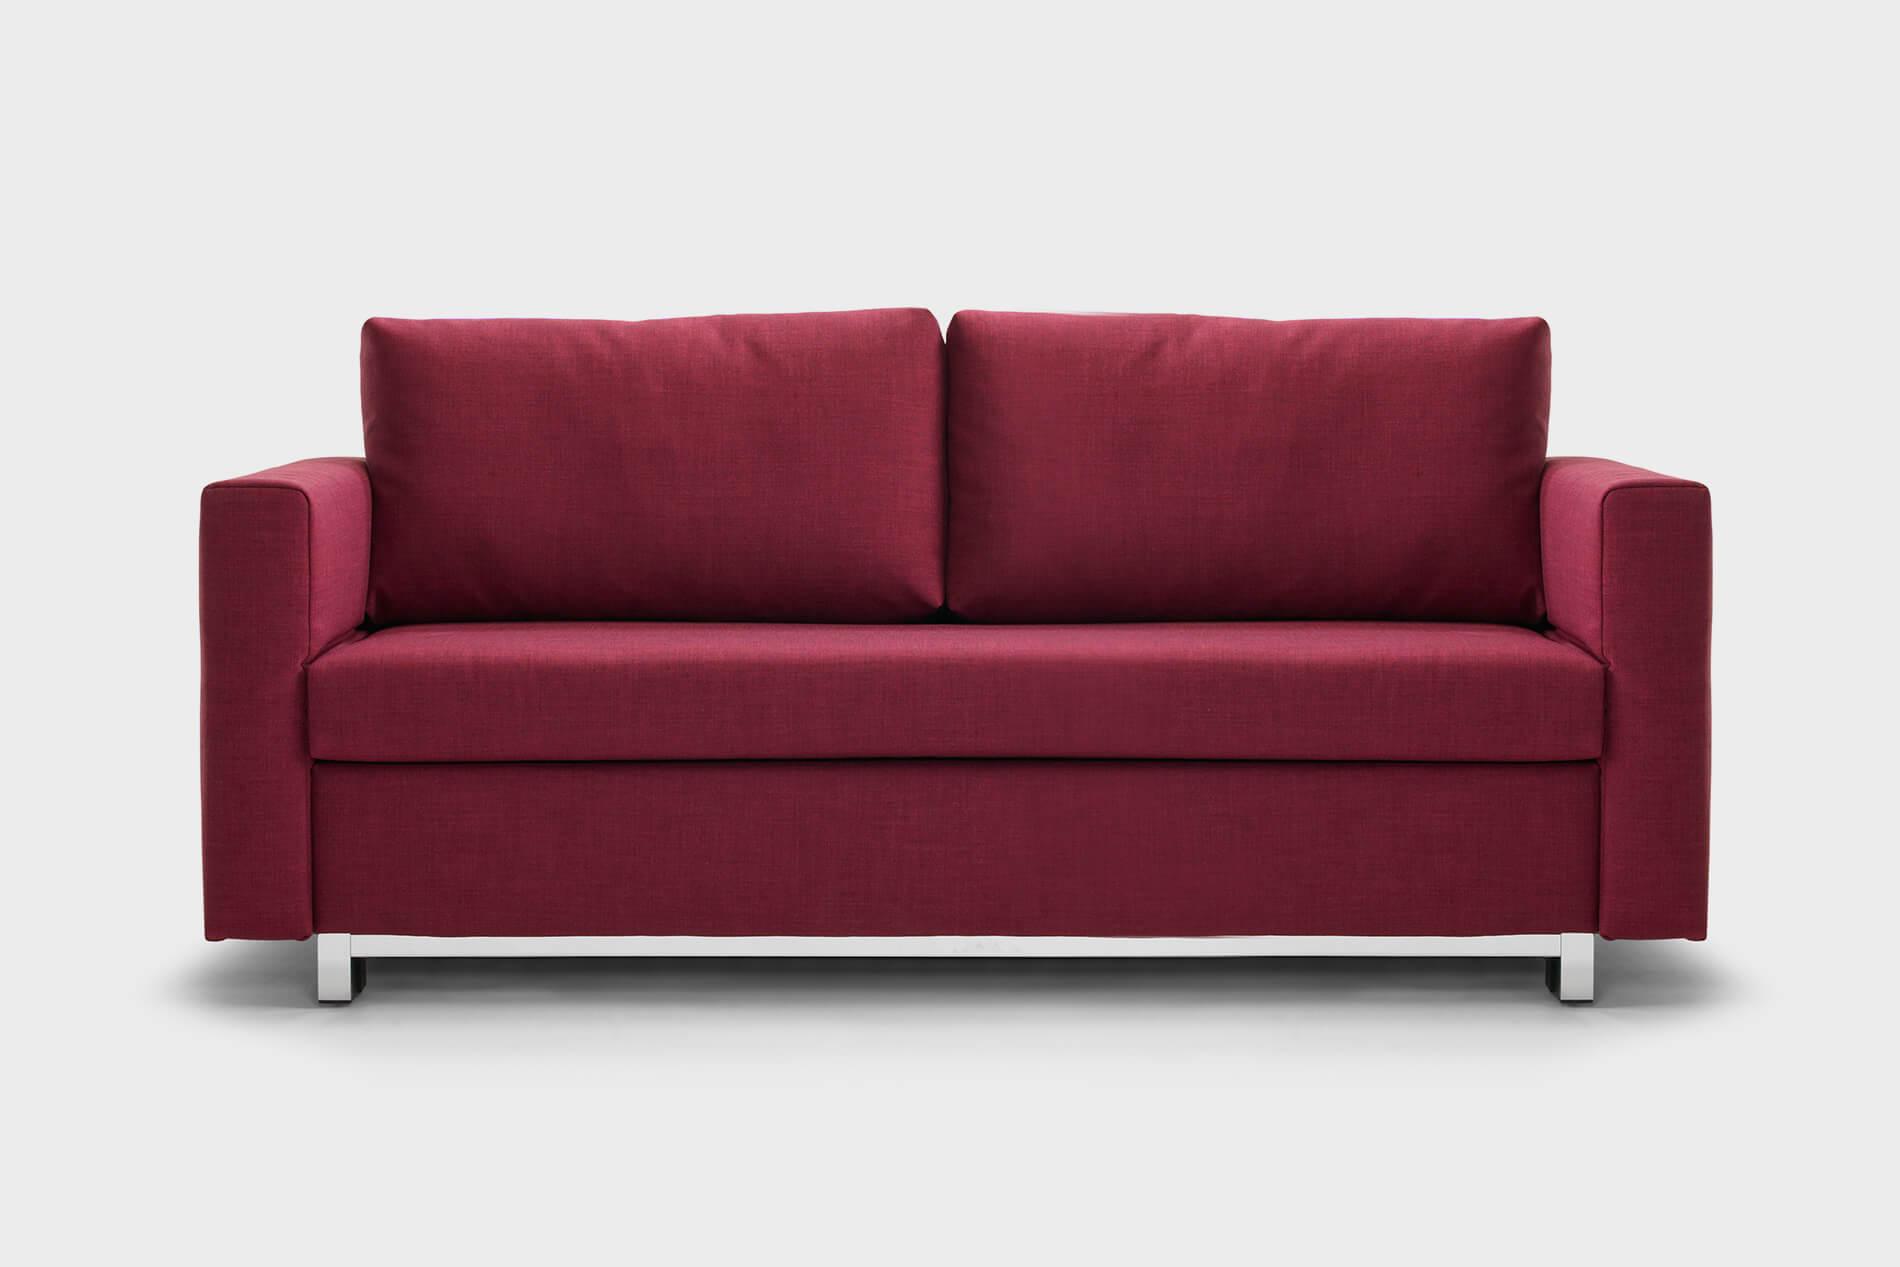 Schlafsofa 140 cm breit trendy modernes schlafsofa for Bettsofa 140 cm breit